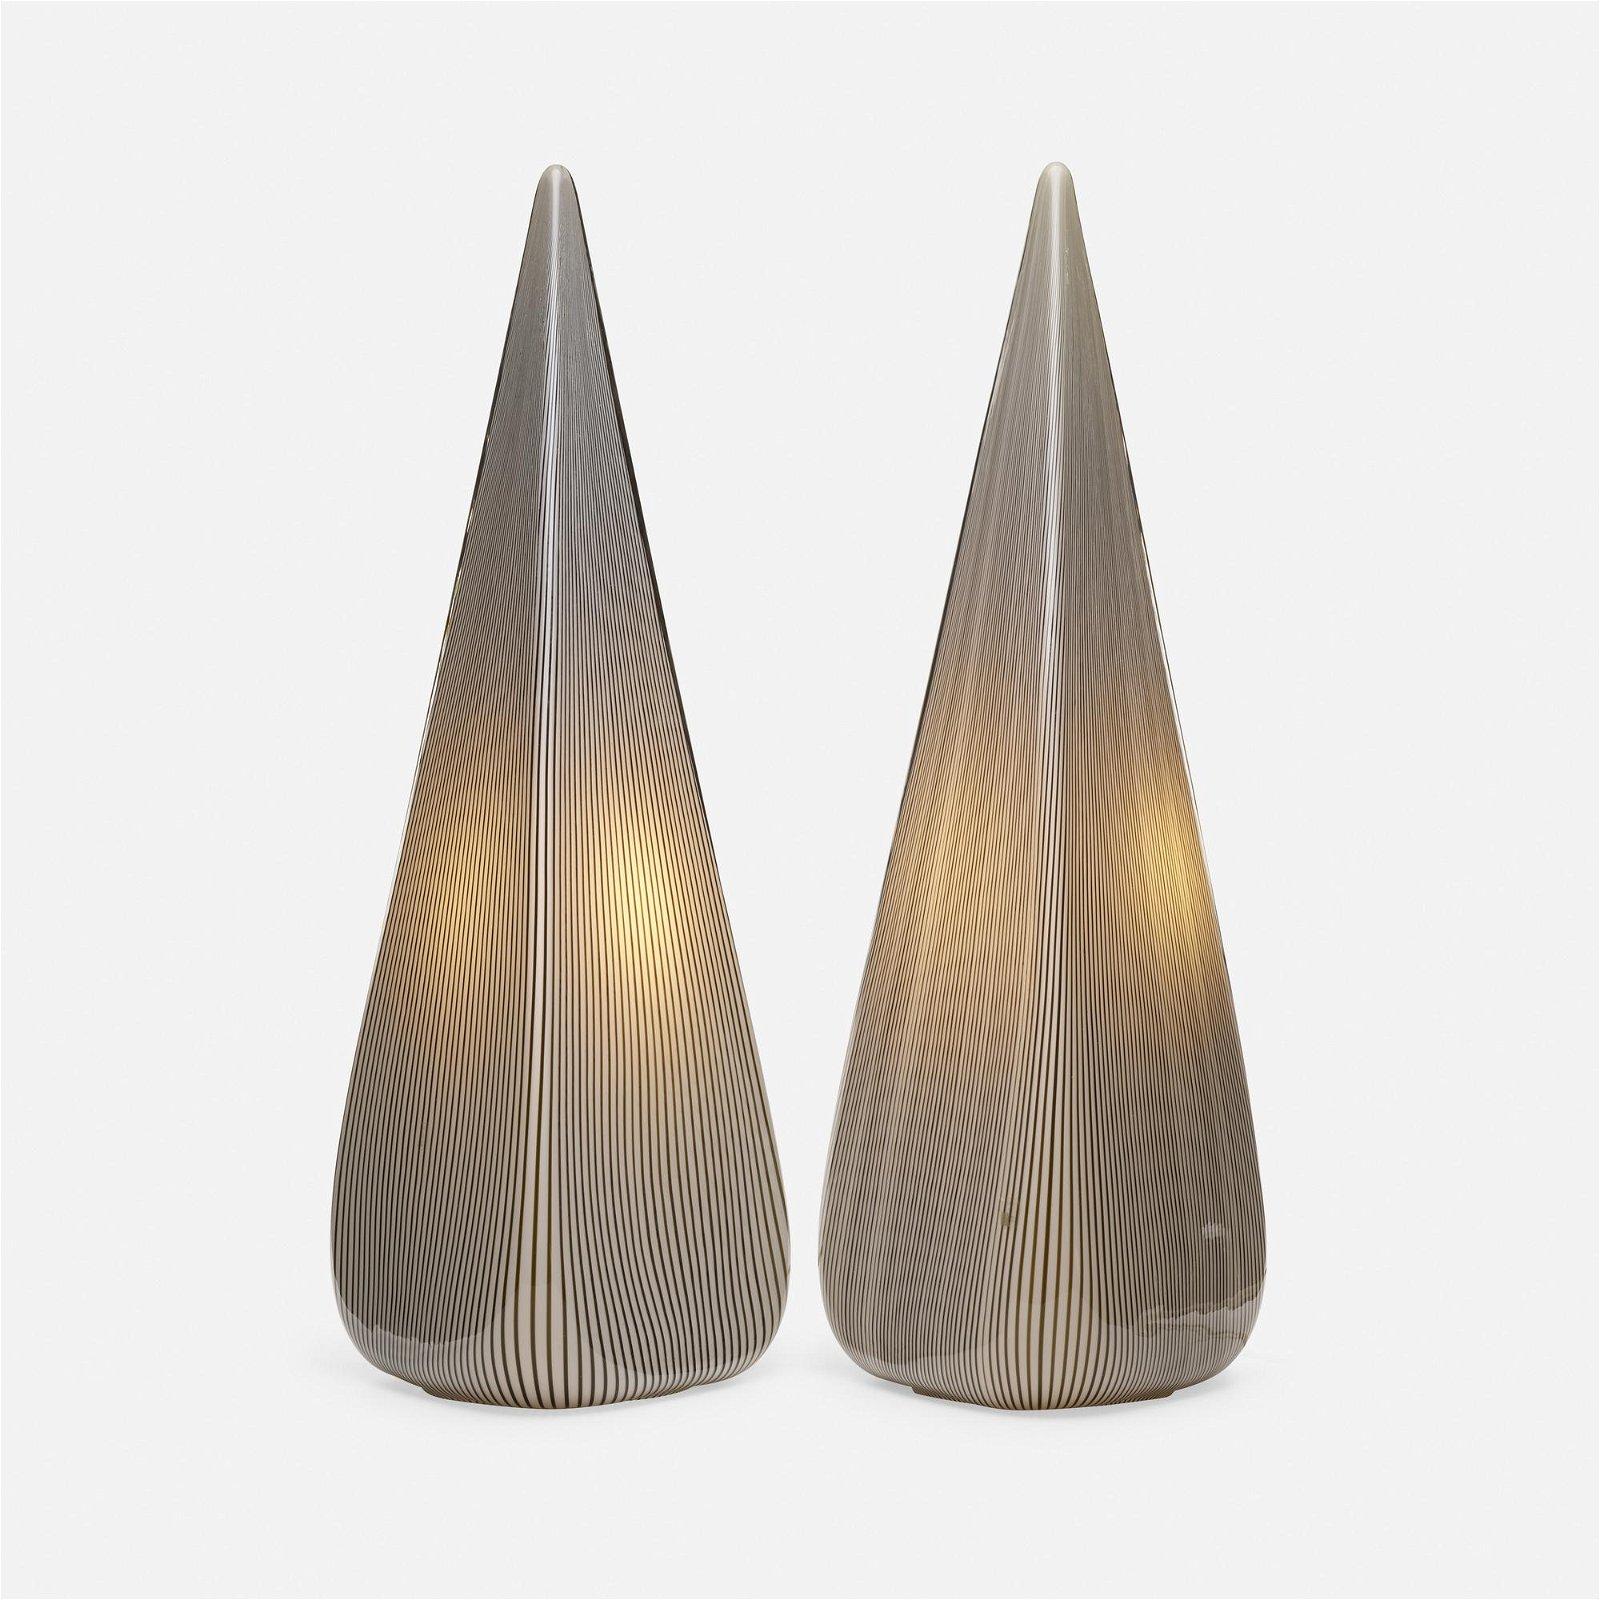 Murano, lamps, pair